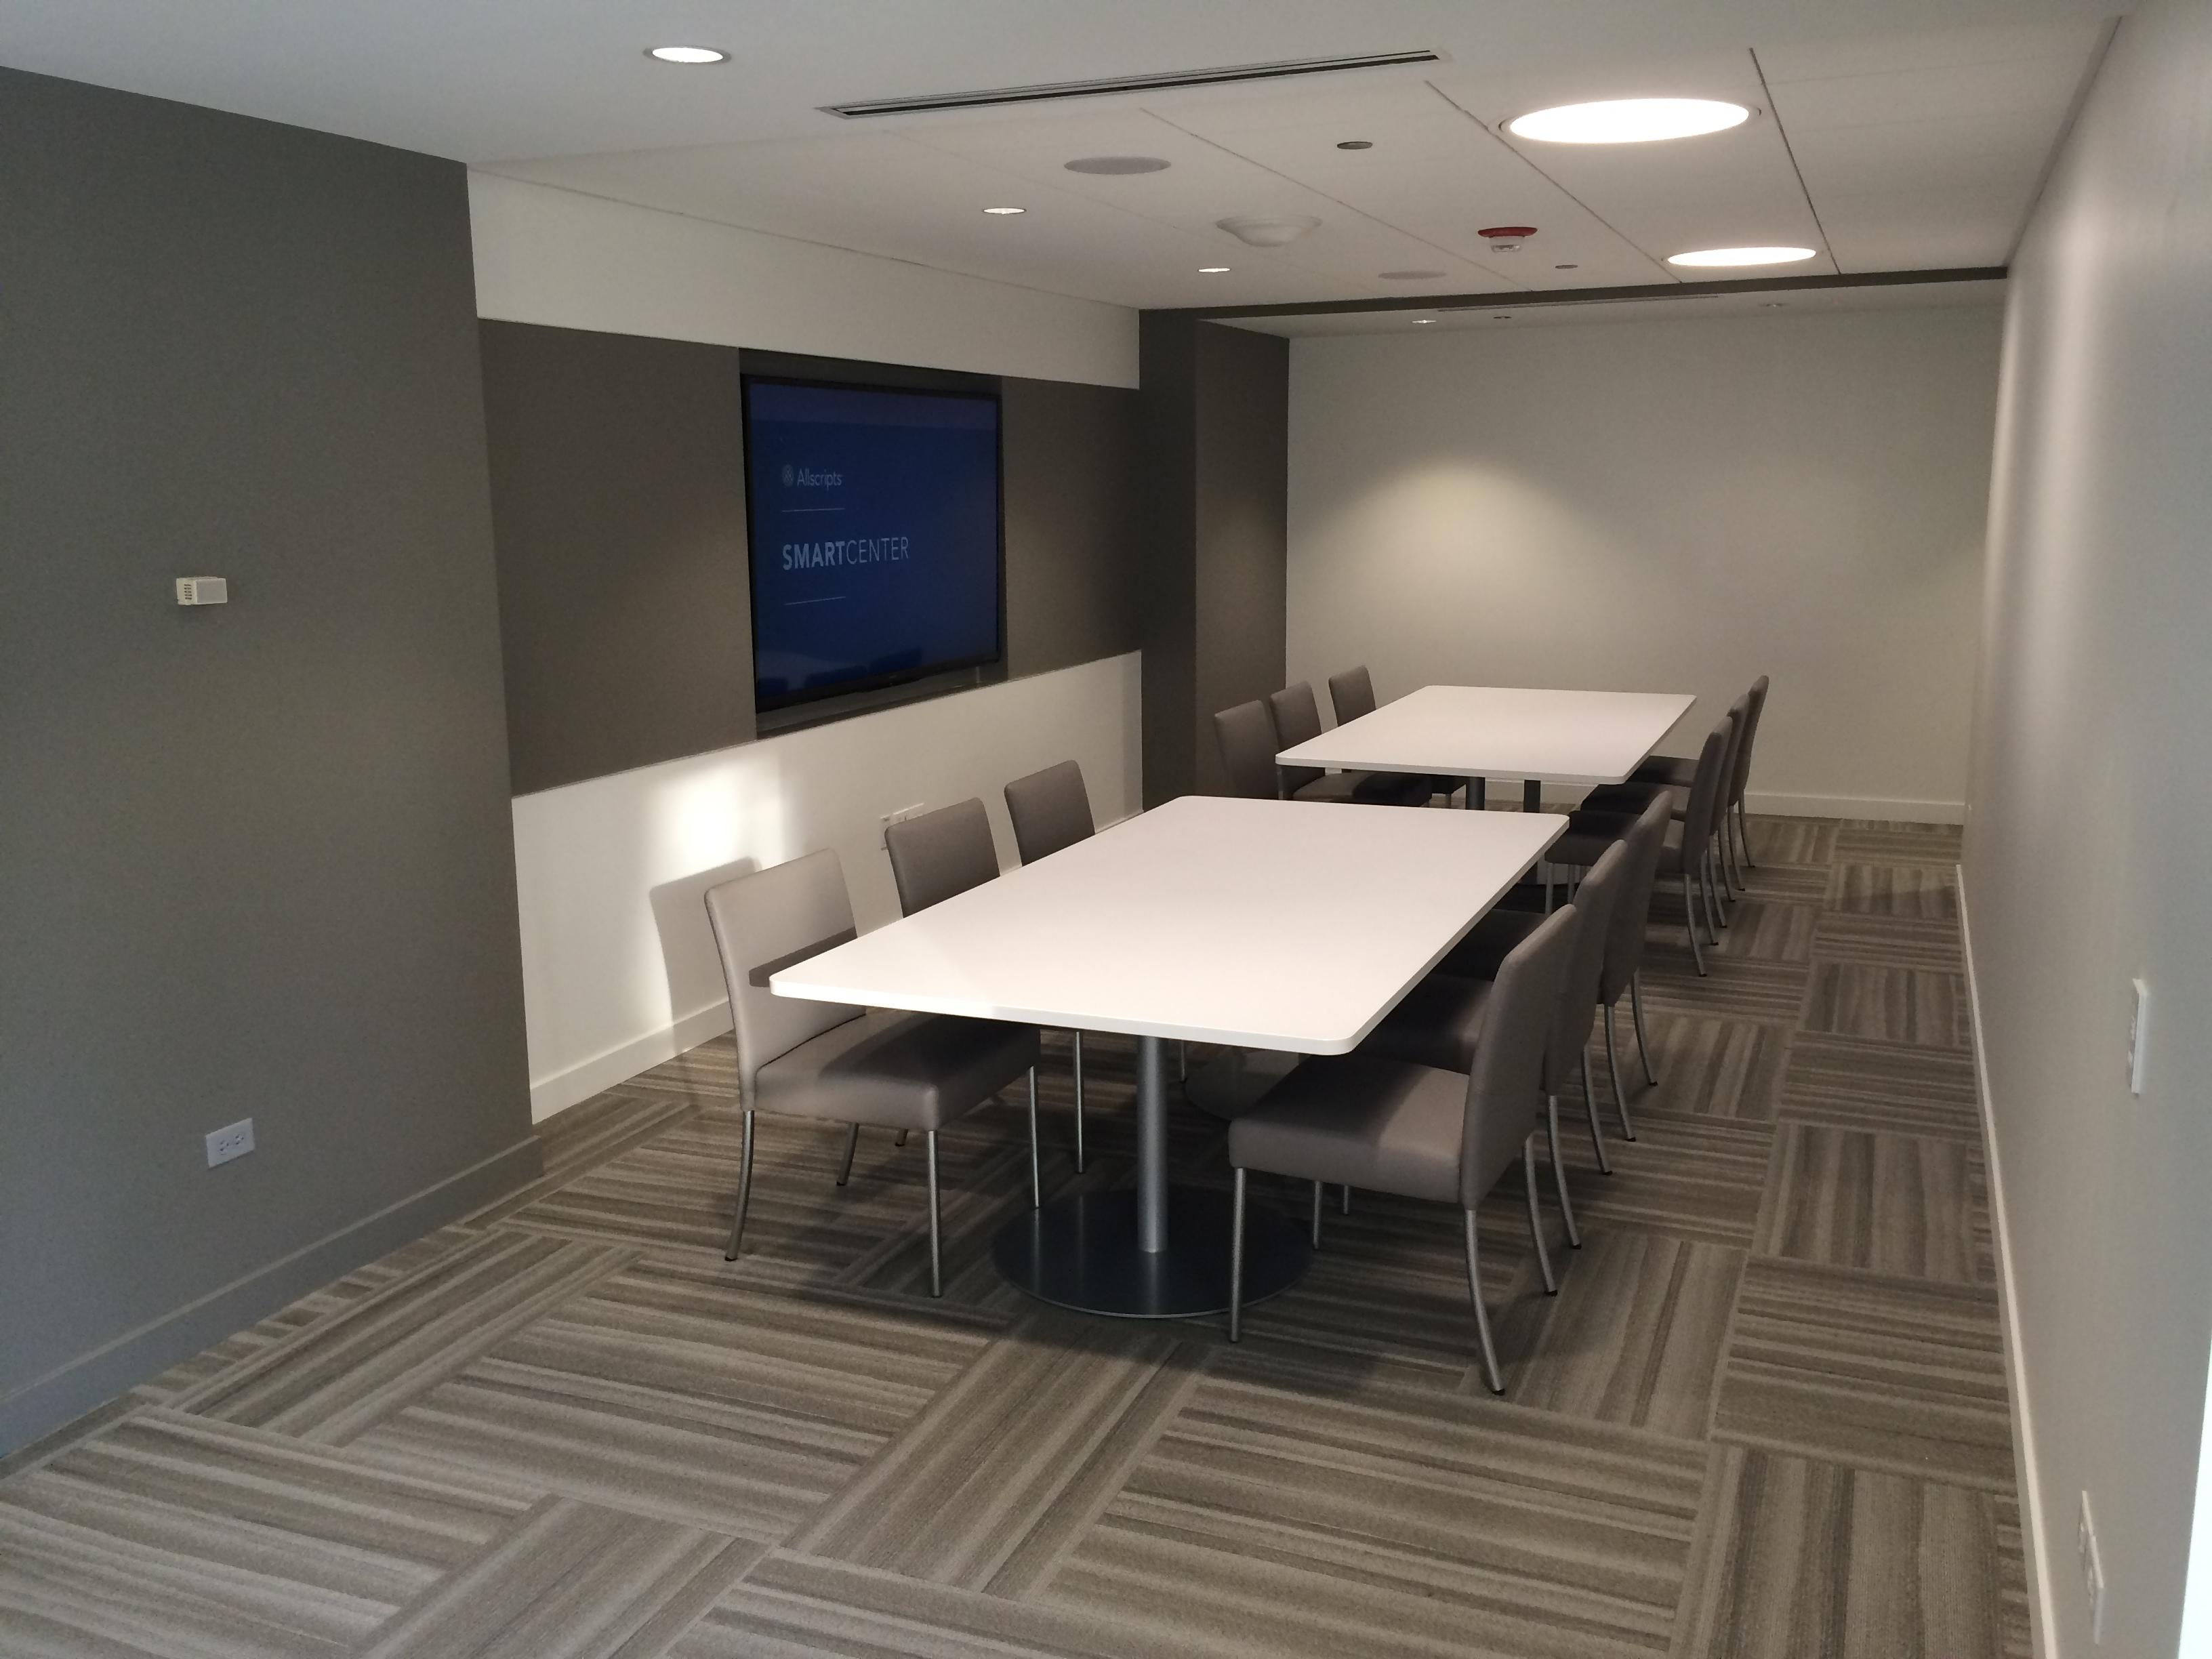 Visitor Center Resource Room